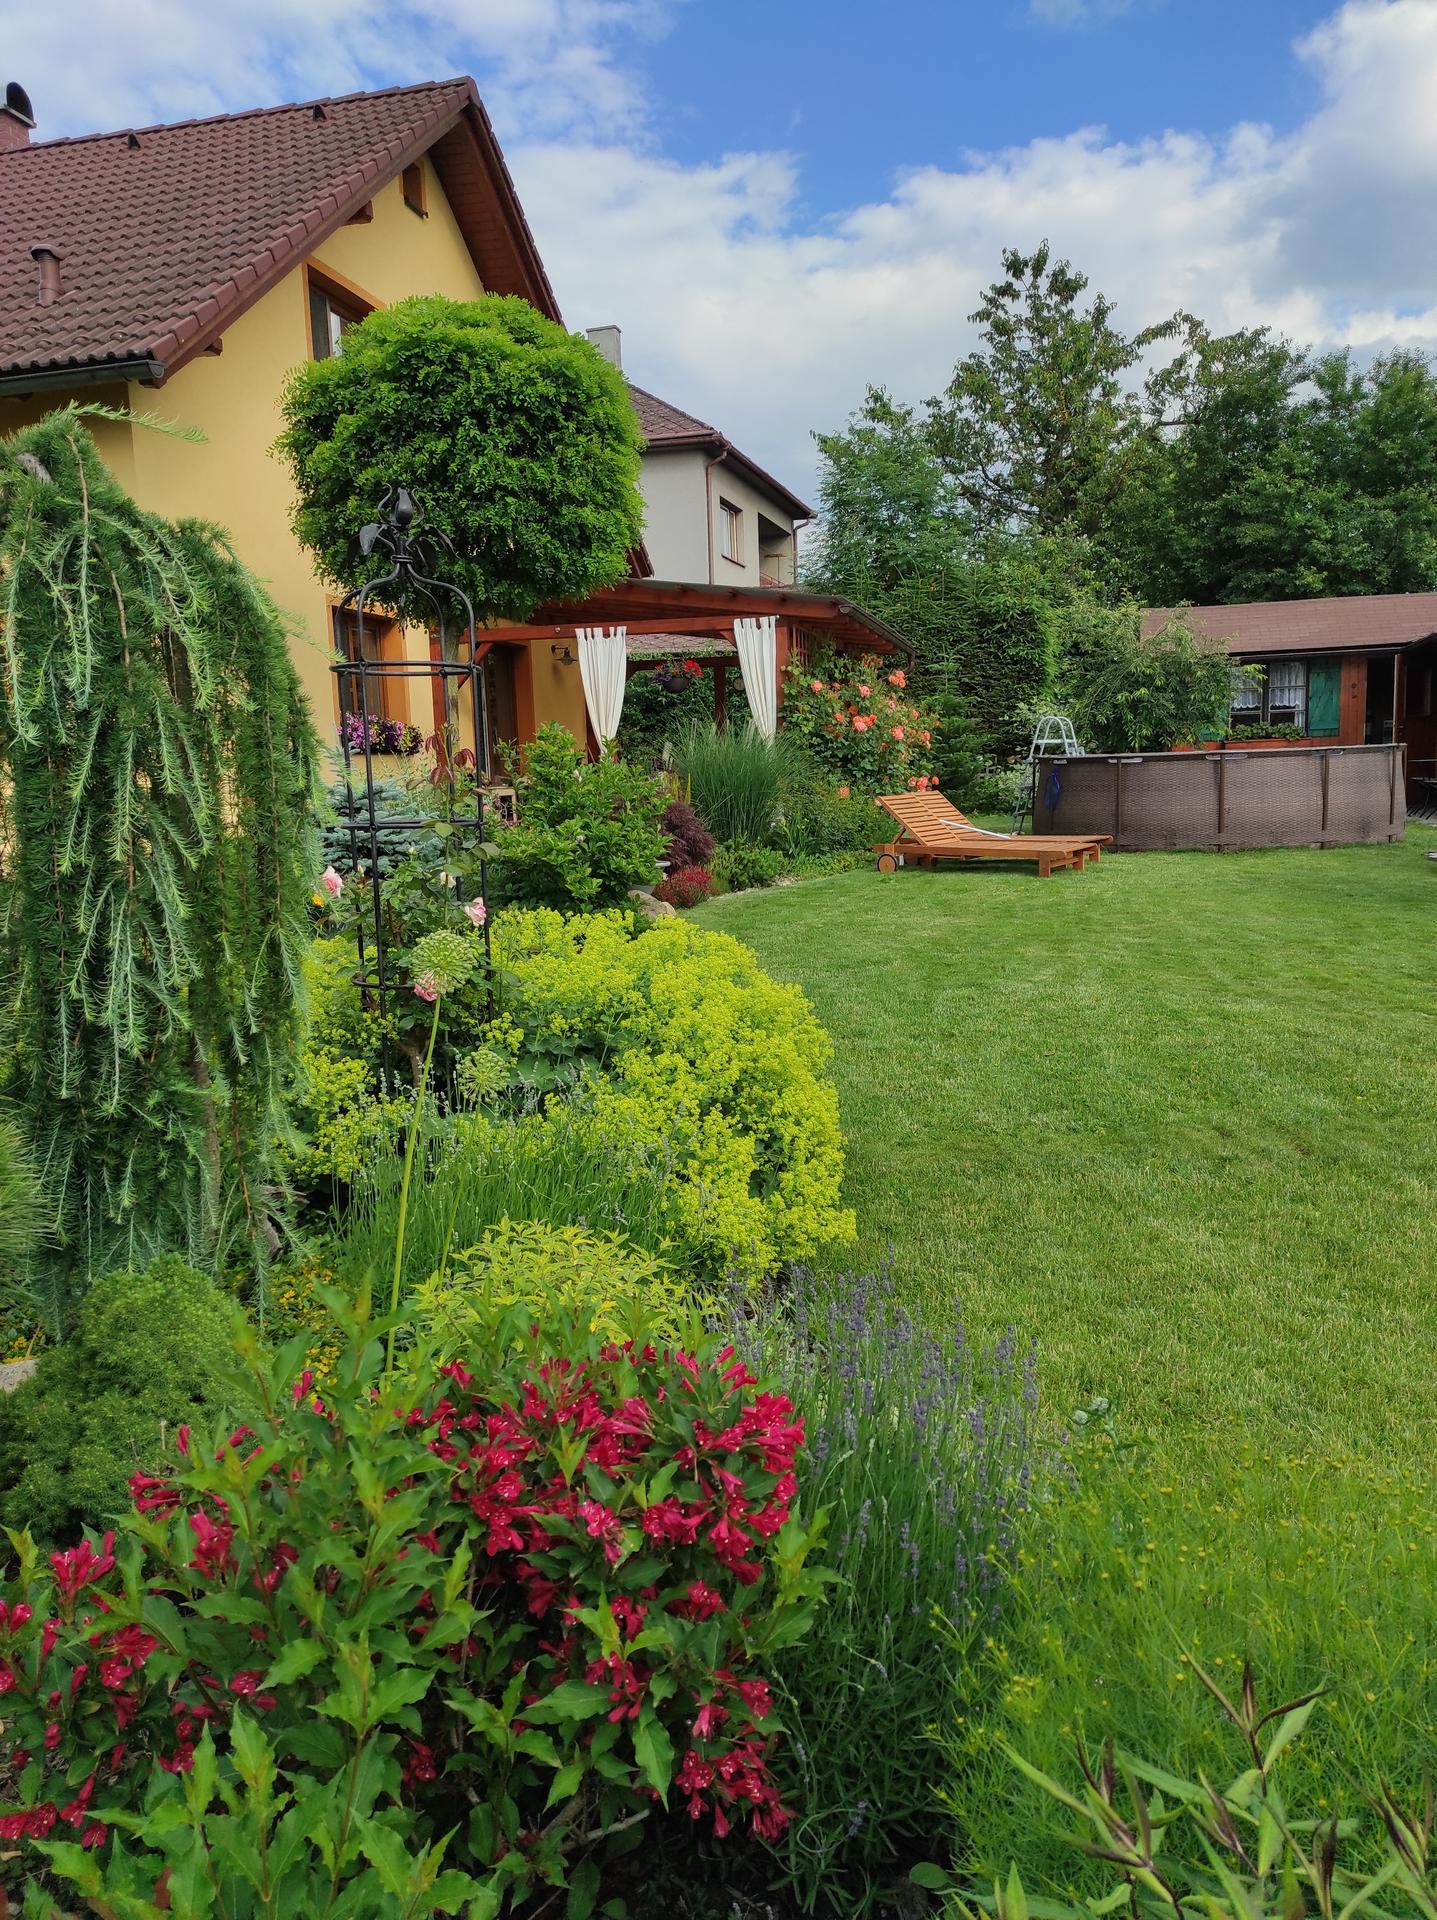 Zahrada 2021 - Obrázek č. 50